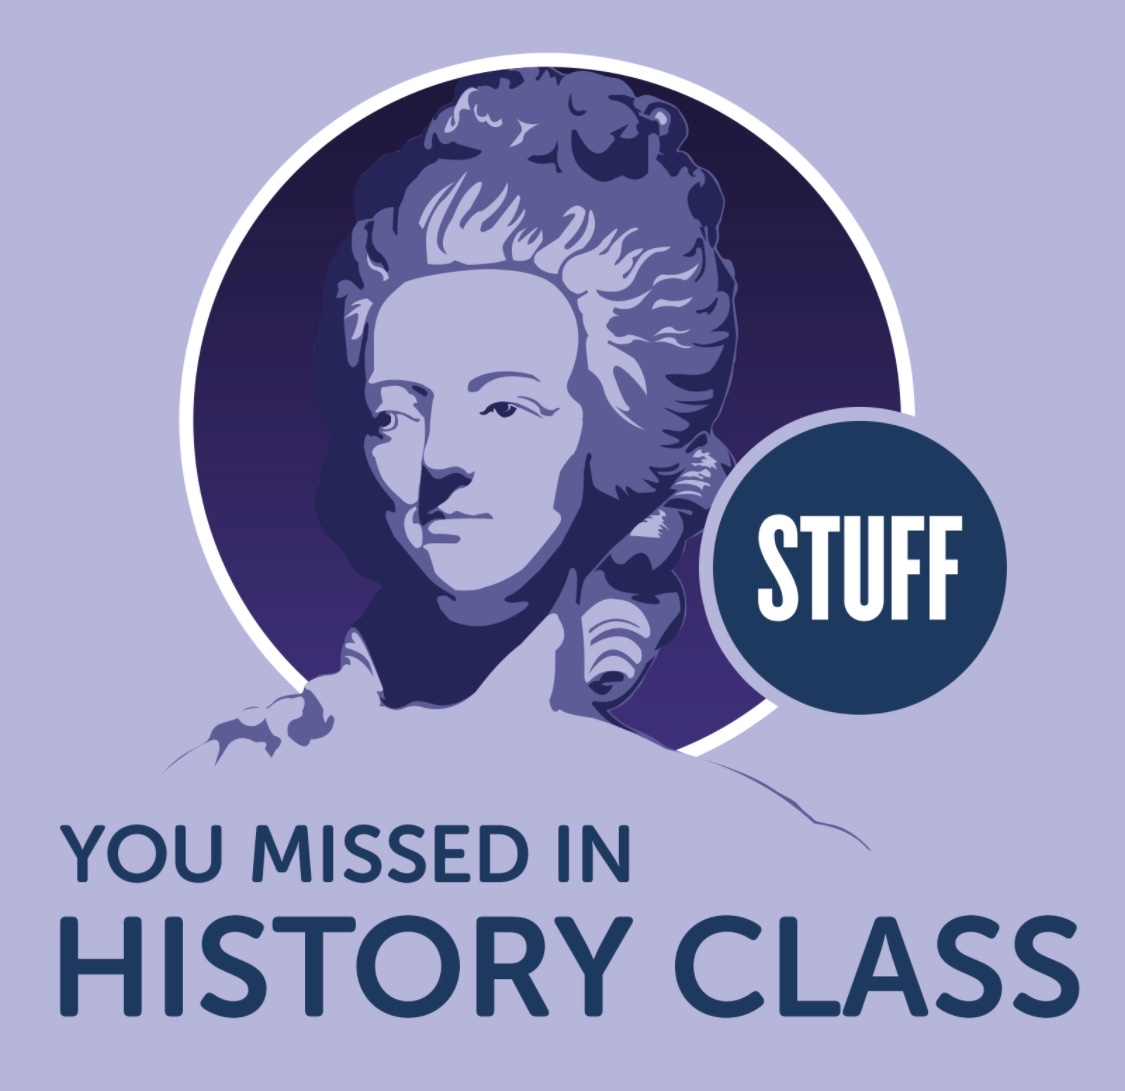 history class.jpg